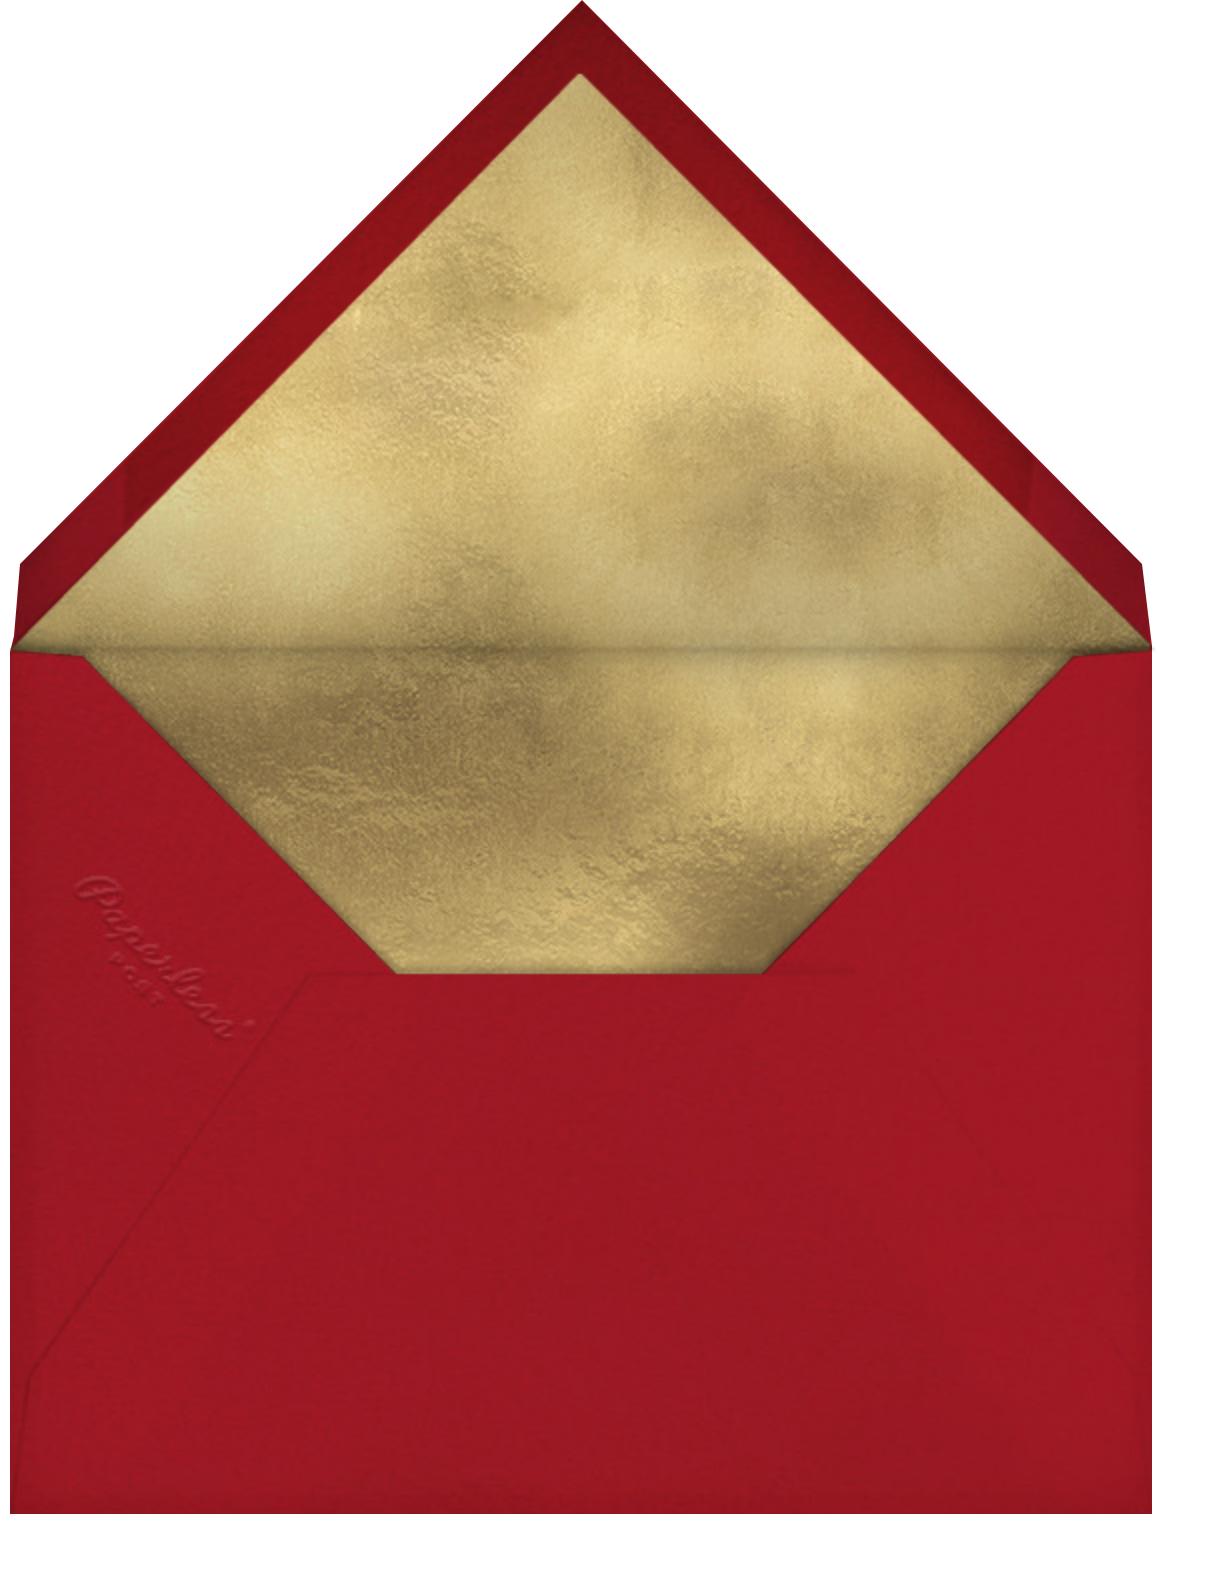 Niu (Invitation) - Paperless Post - Lunar New Year - envelope back